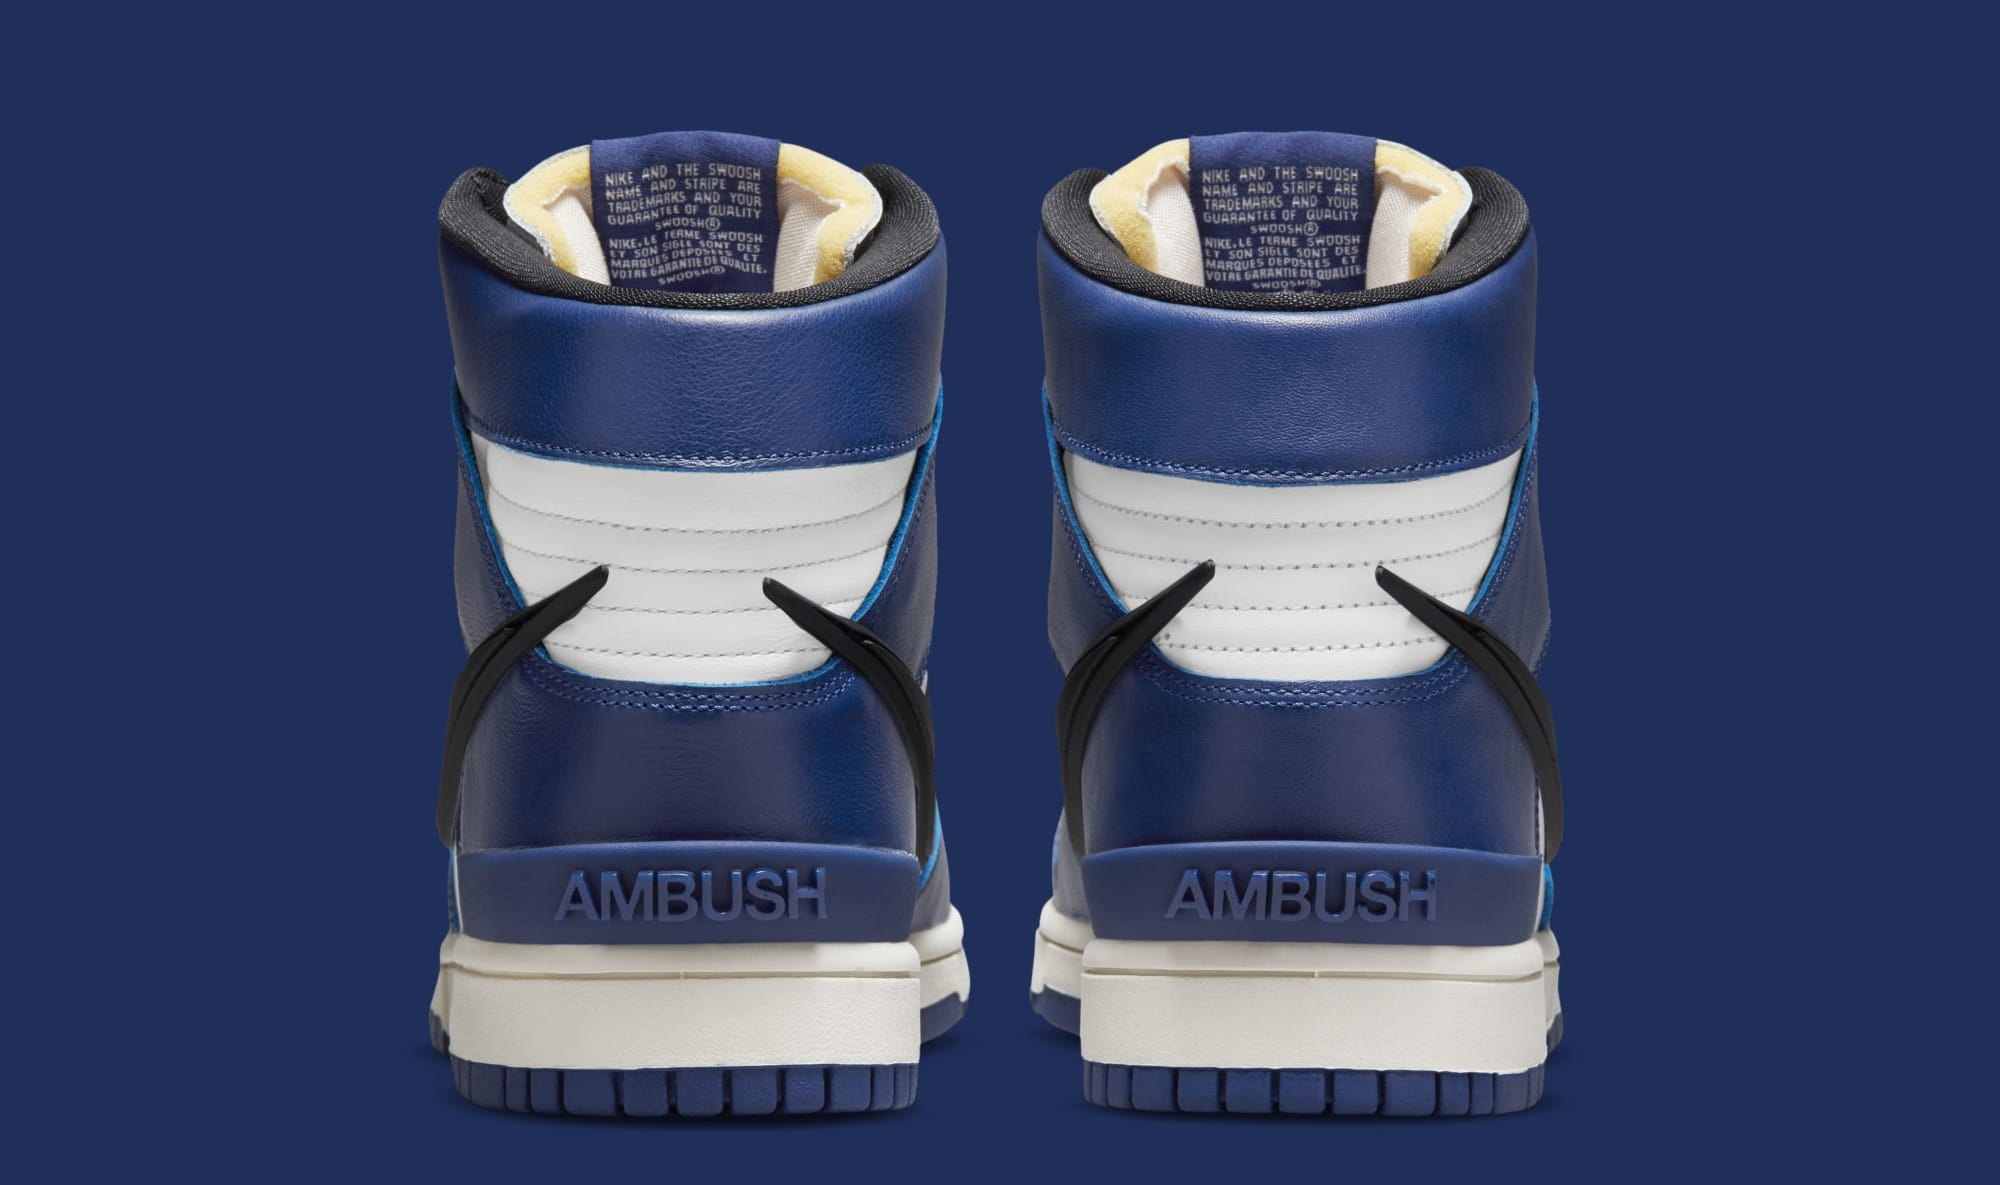 Ambush x Nike Dunk High 'Deep Royal Blue' CU7544-400 (Heel)